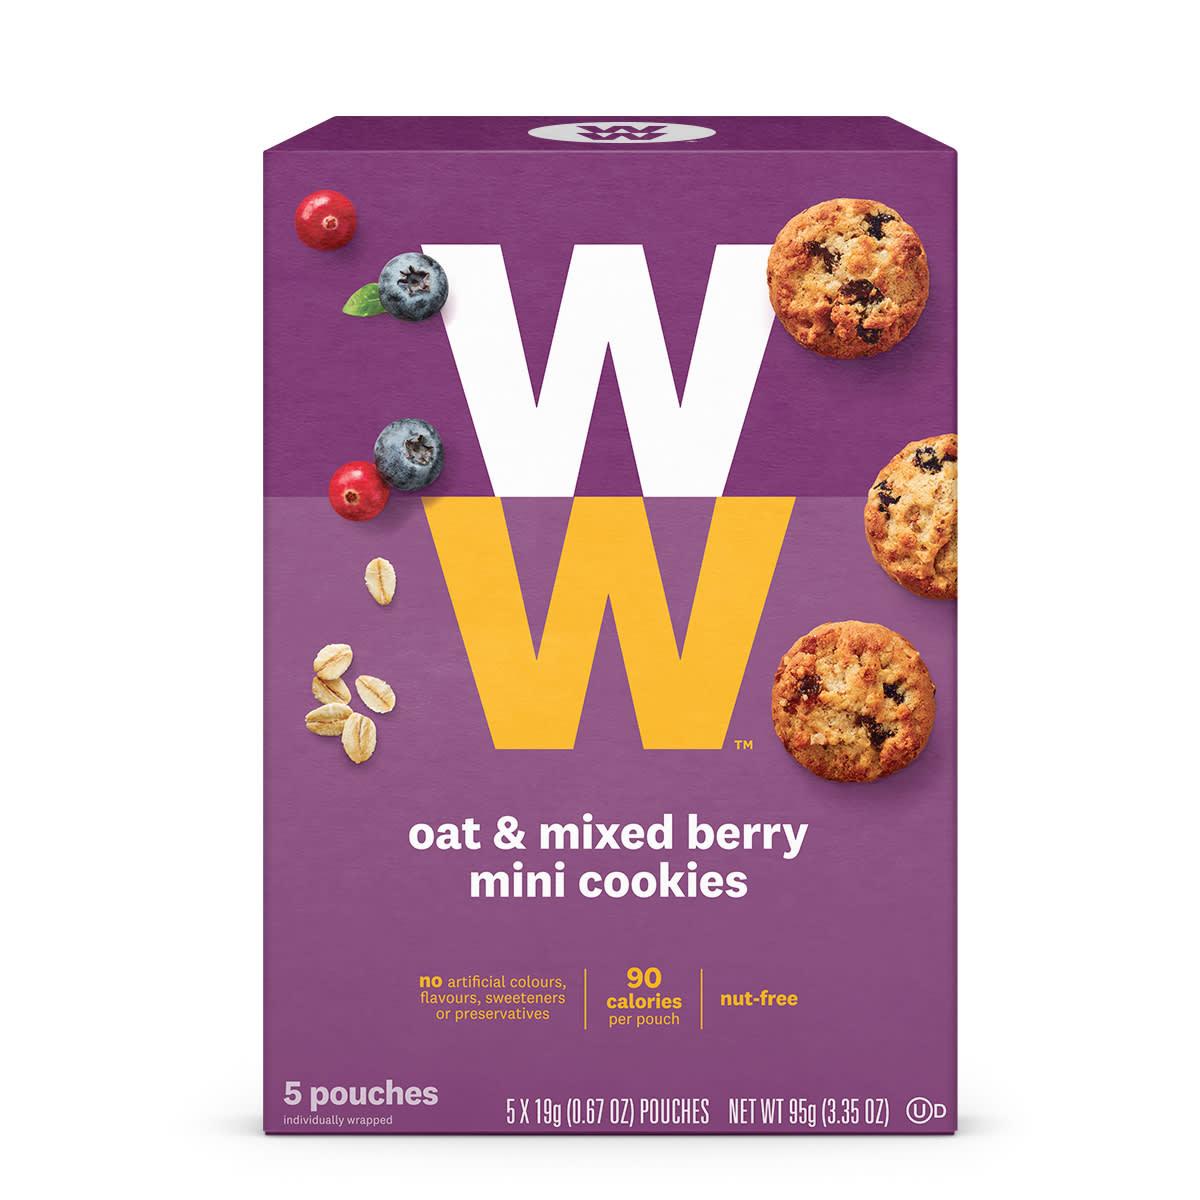 Oat & Mixed Berry Mini Cookies